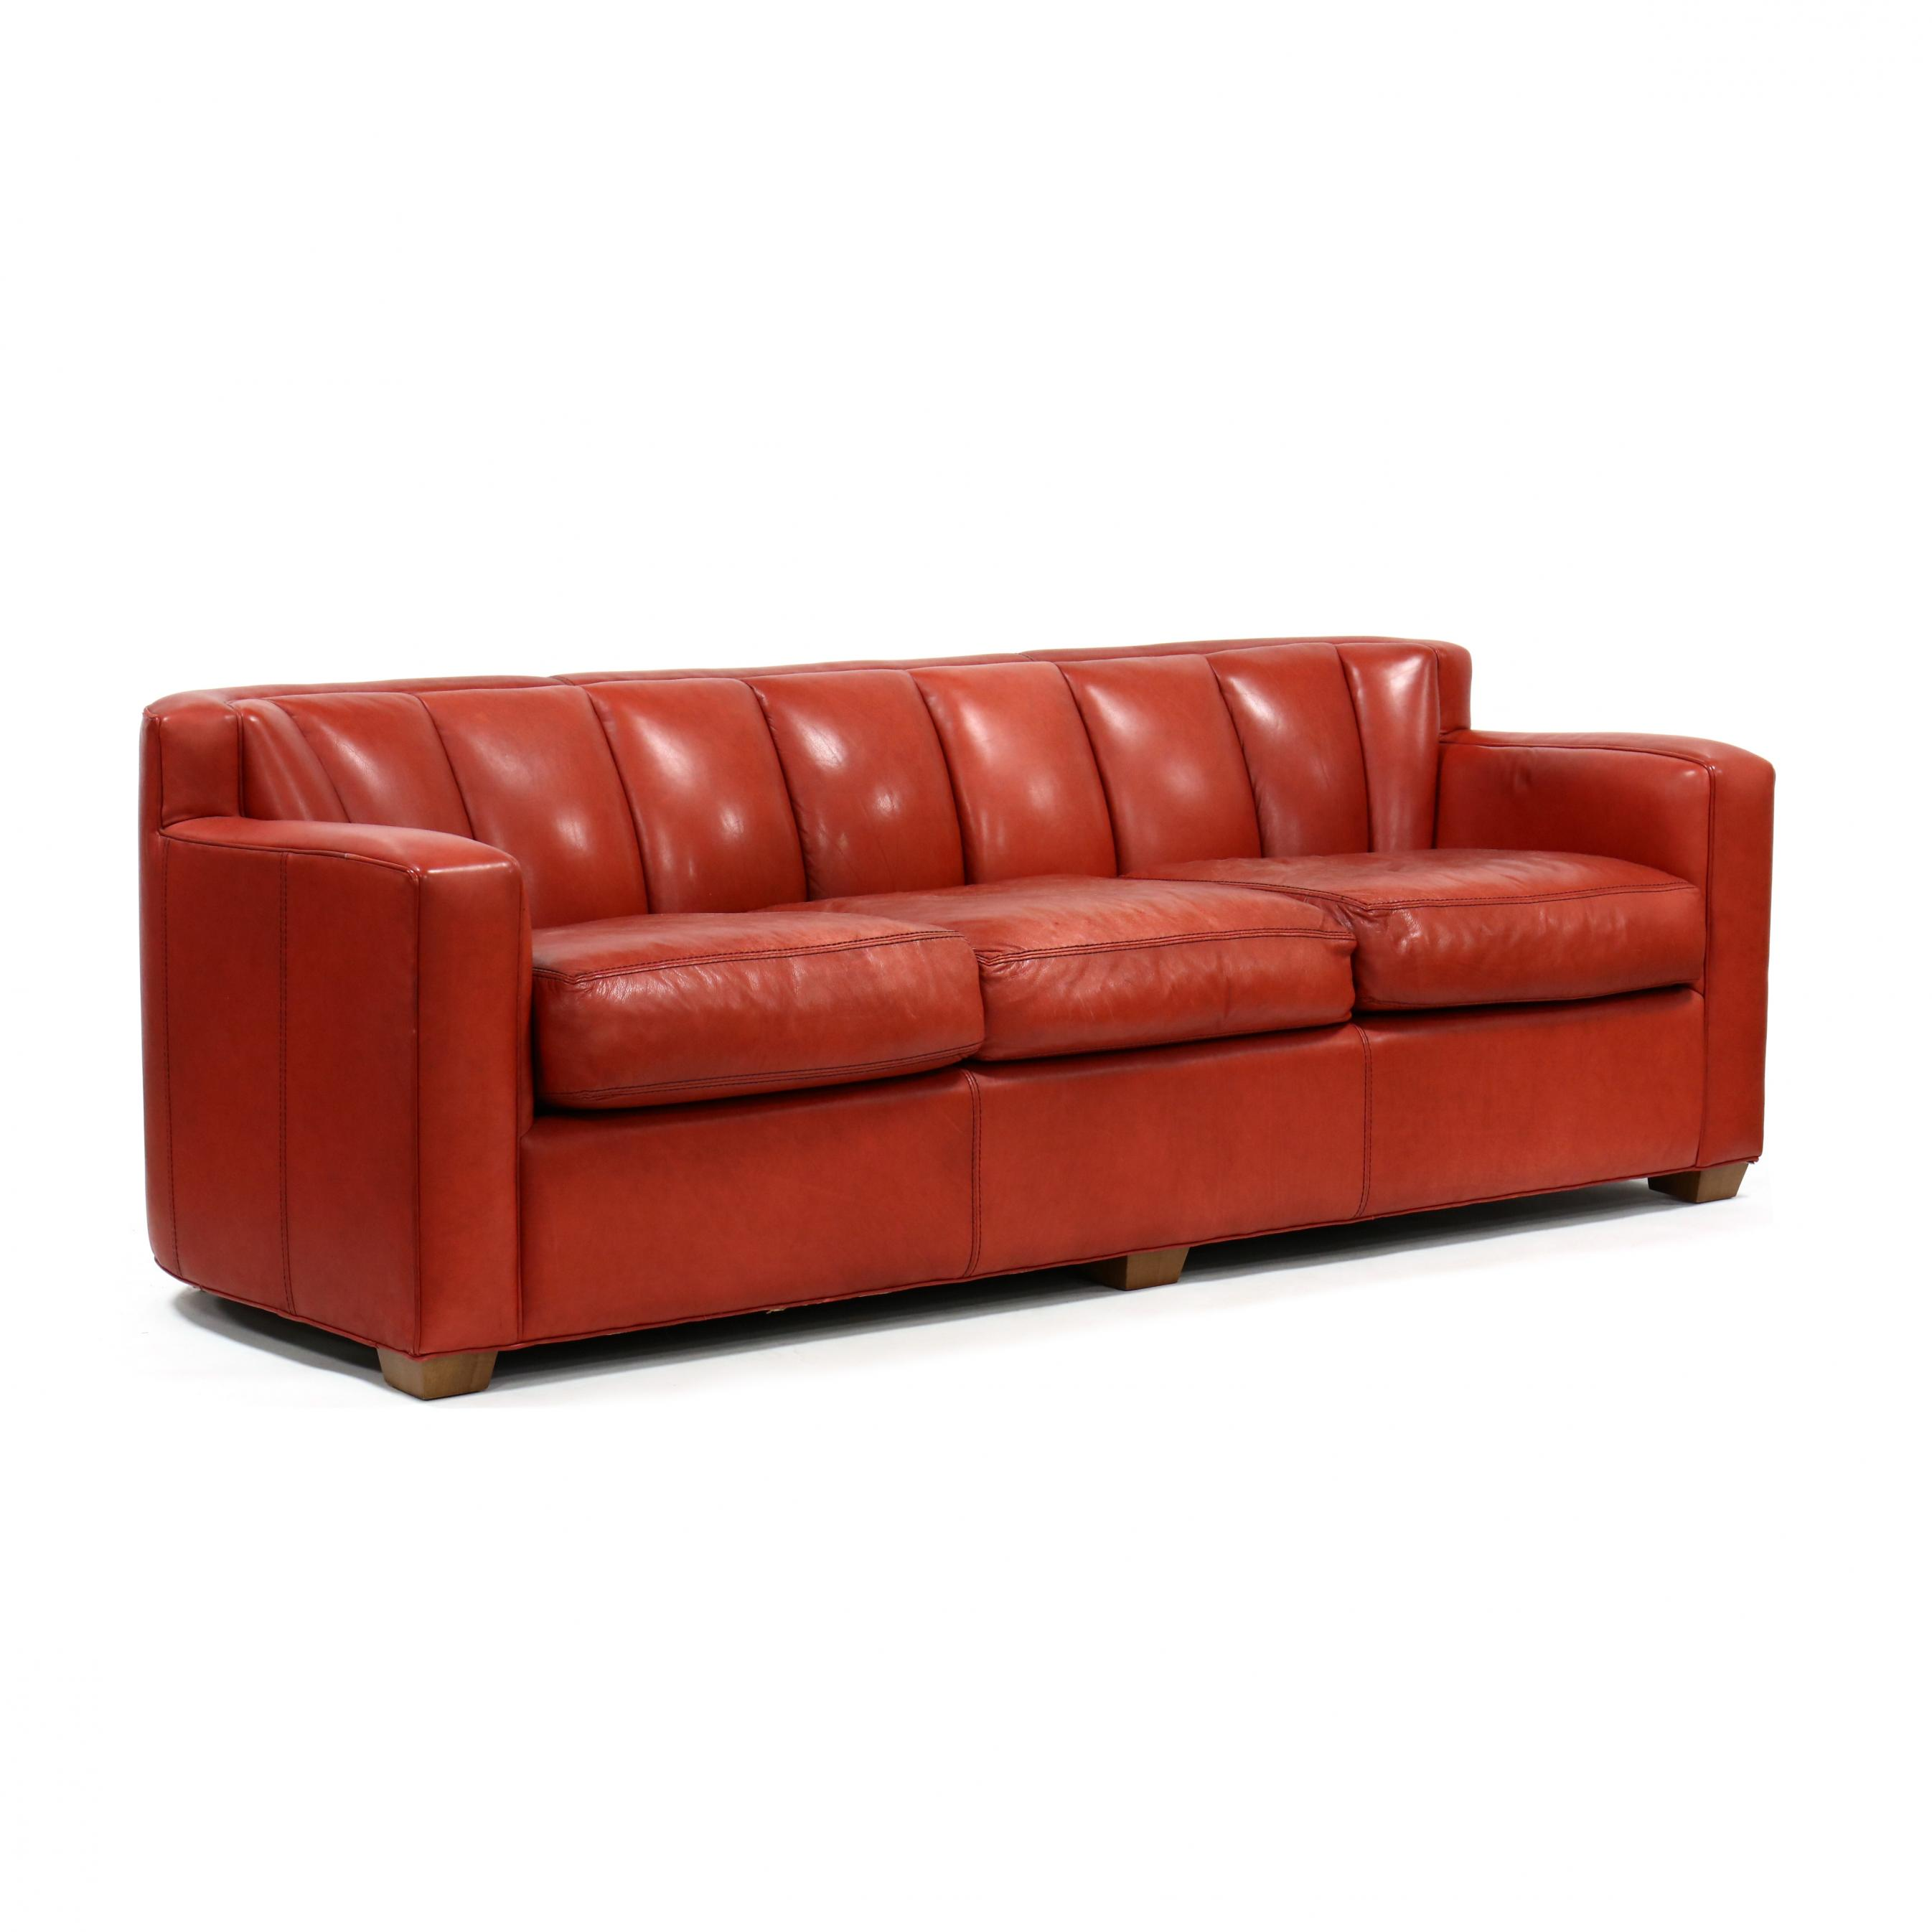 thomasville-furniture-modern-red-leather-sofa